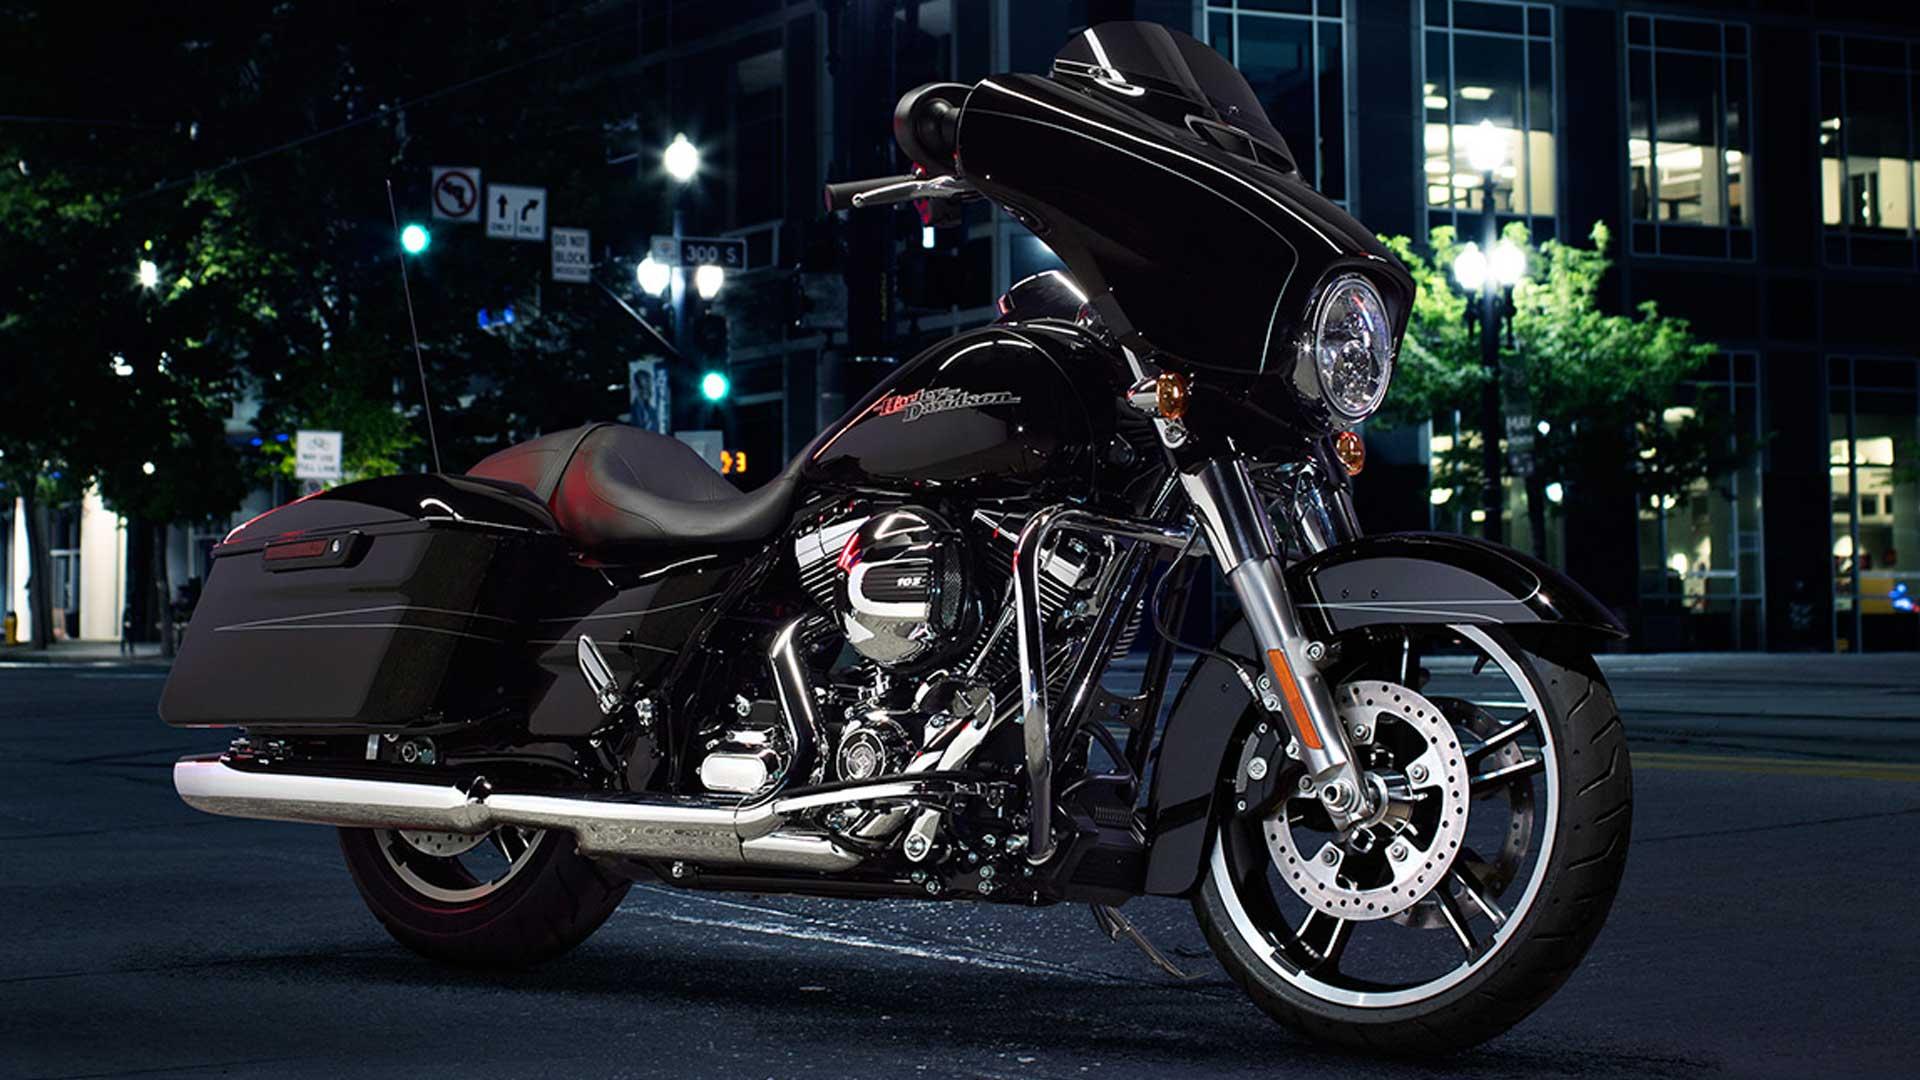 Harley-Davidson Street Glide 2015 Special Exterior